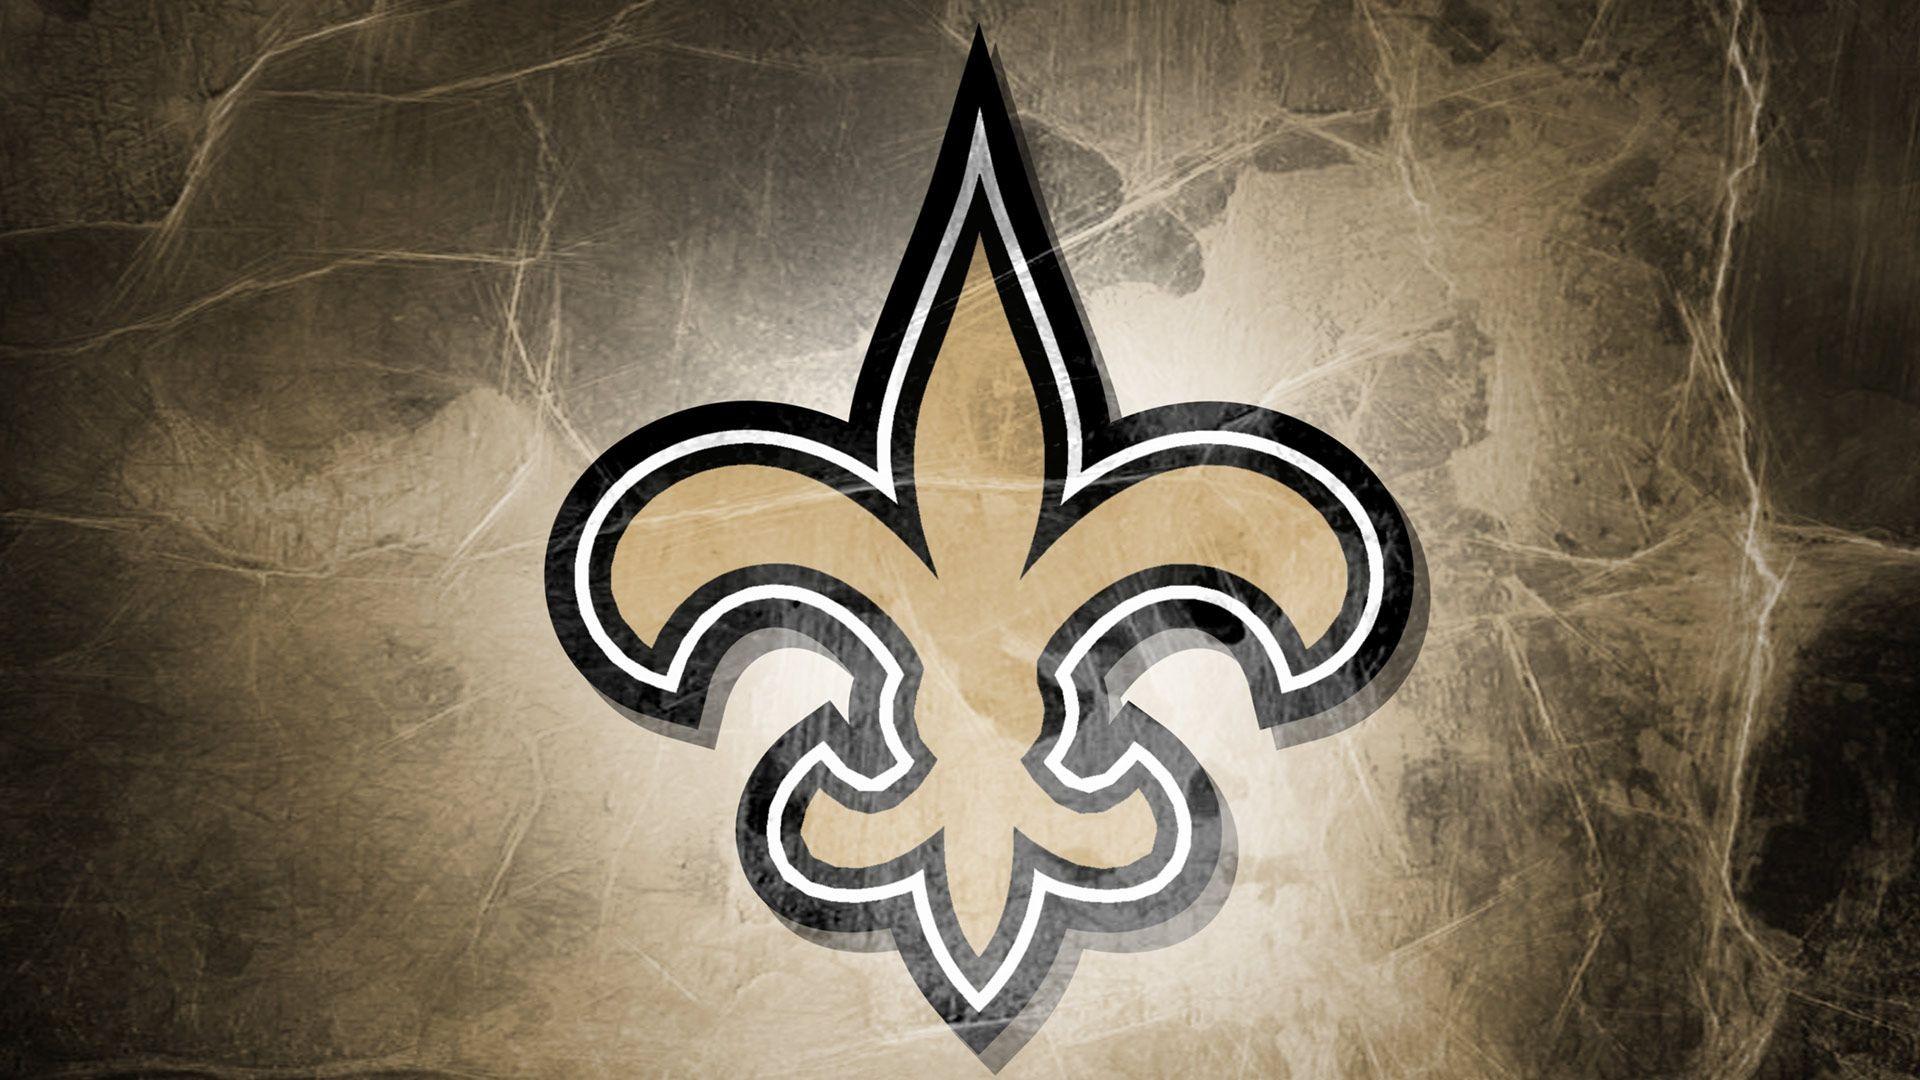 New Orleans Saints Wallpaper HD 2021 NFL Football Wallpapers 1920x1080